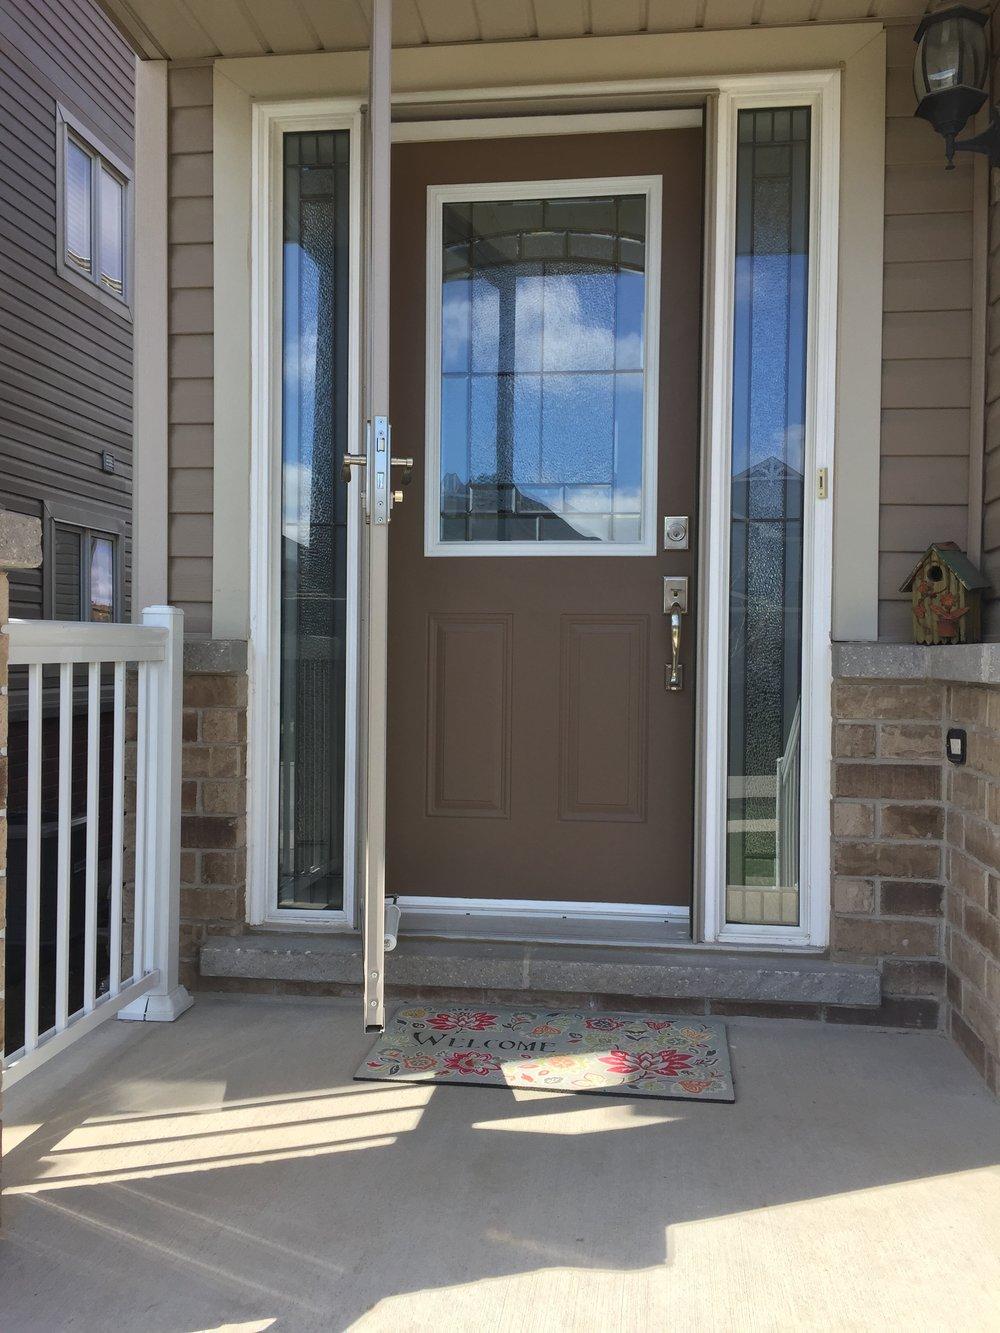 Ashbourne-Decortive-glass-door-insert-orillia-on